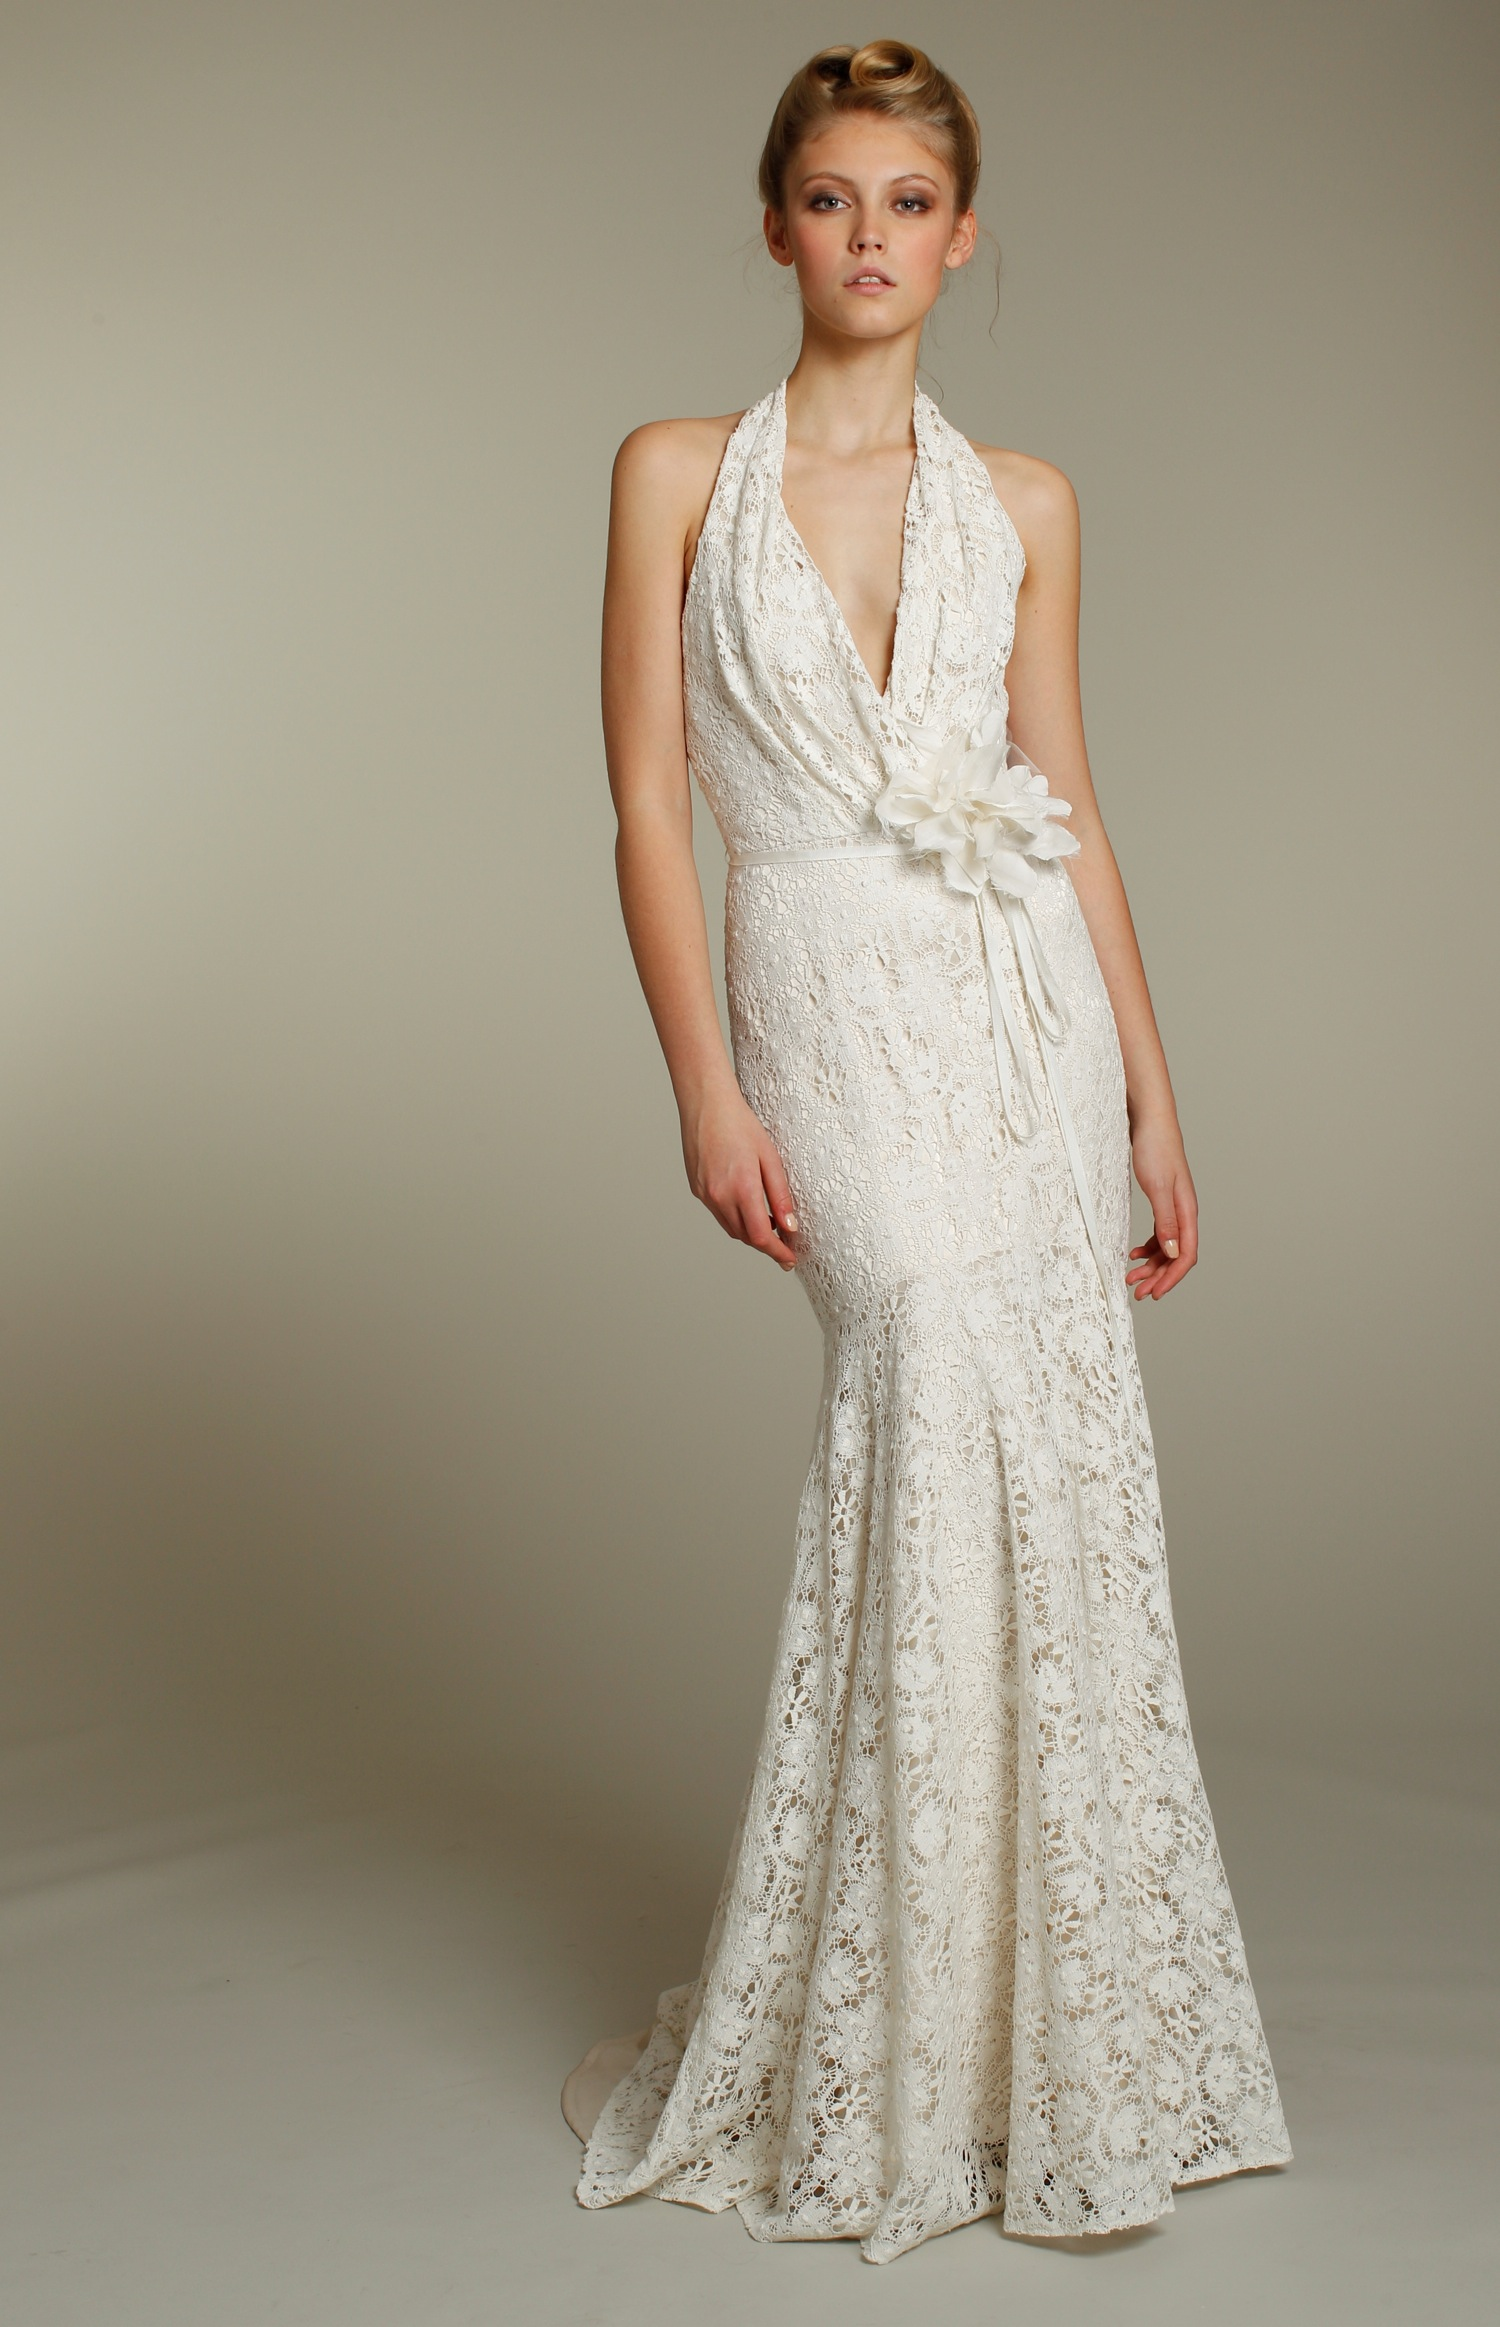 lace informal wedding dresses photo - 1